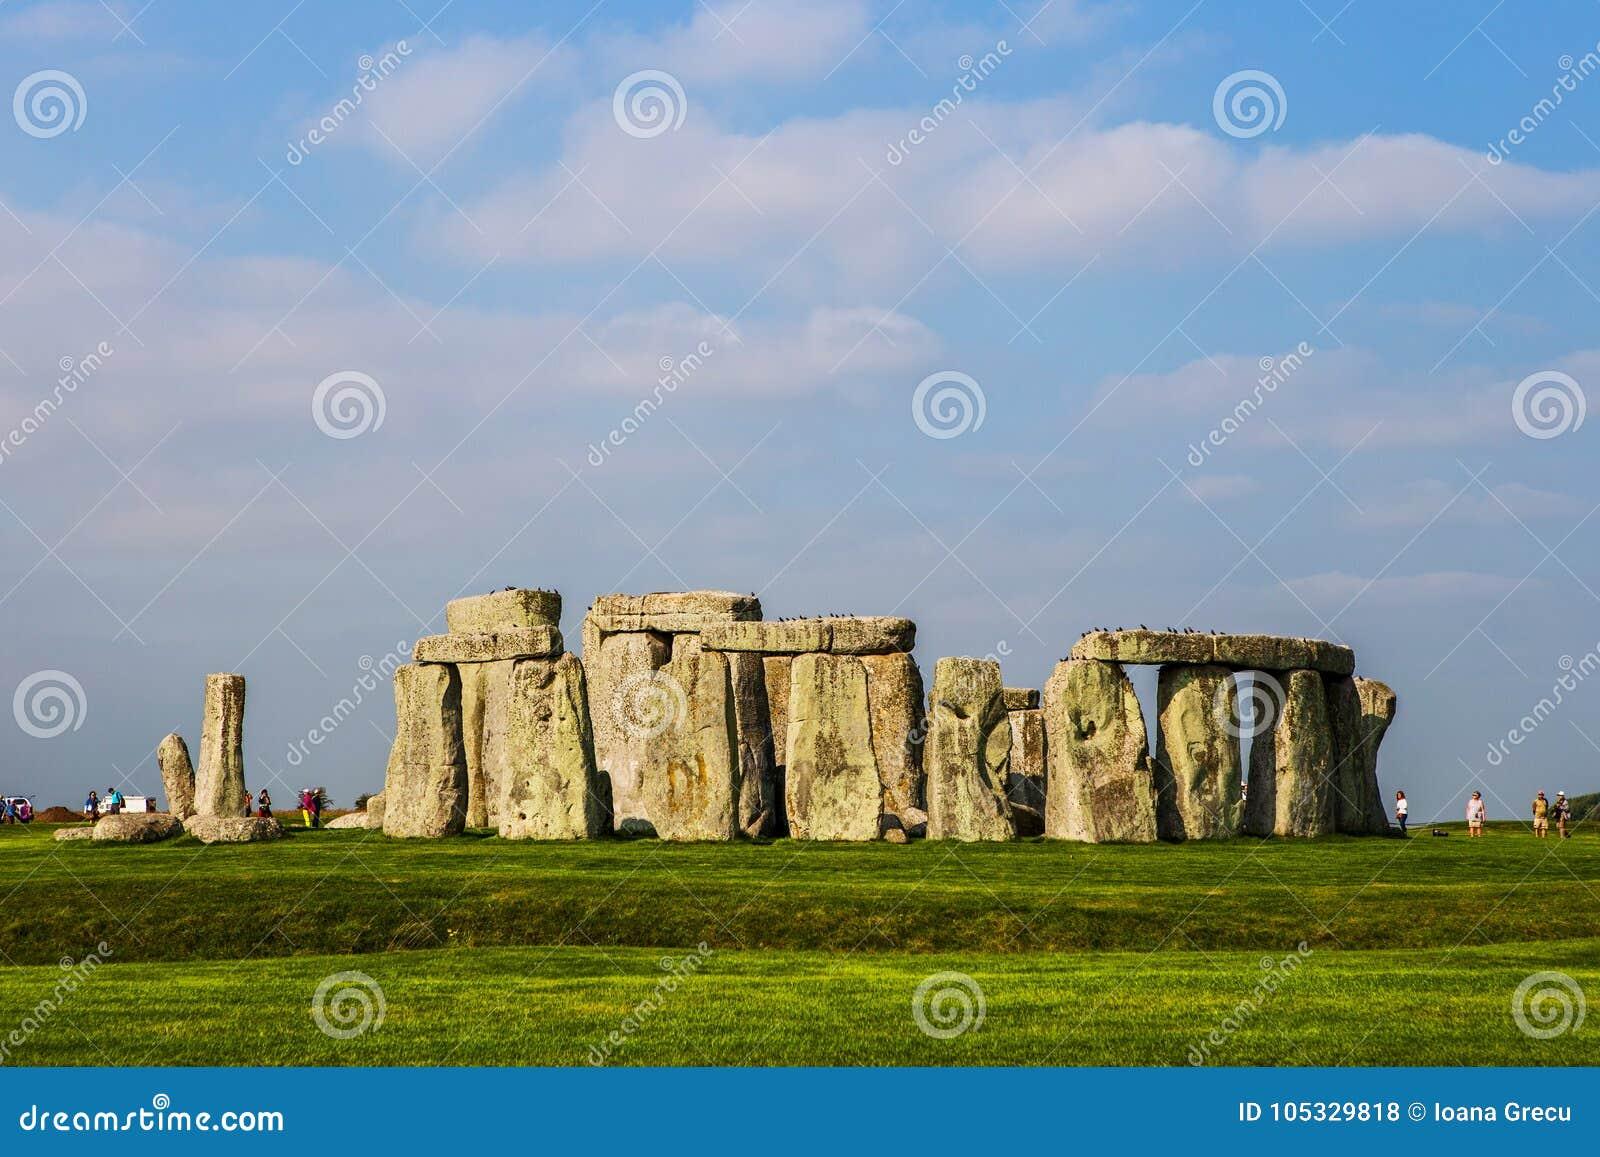 Stonehenge monument at Salisbury planes